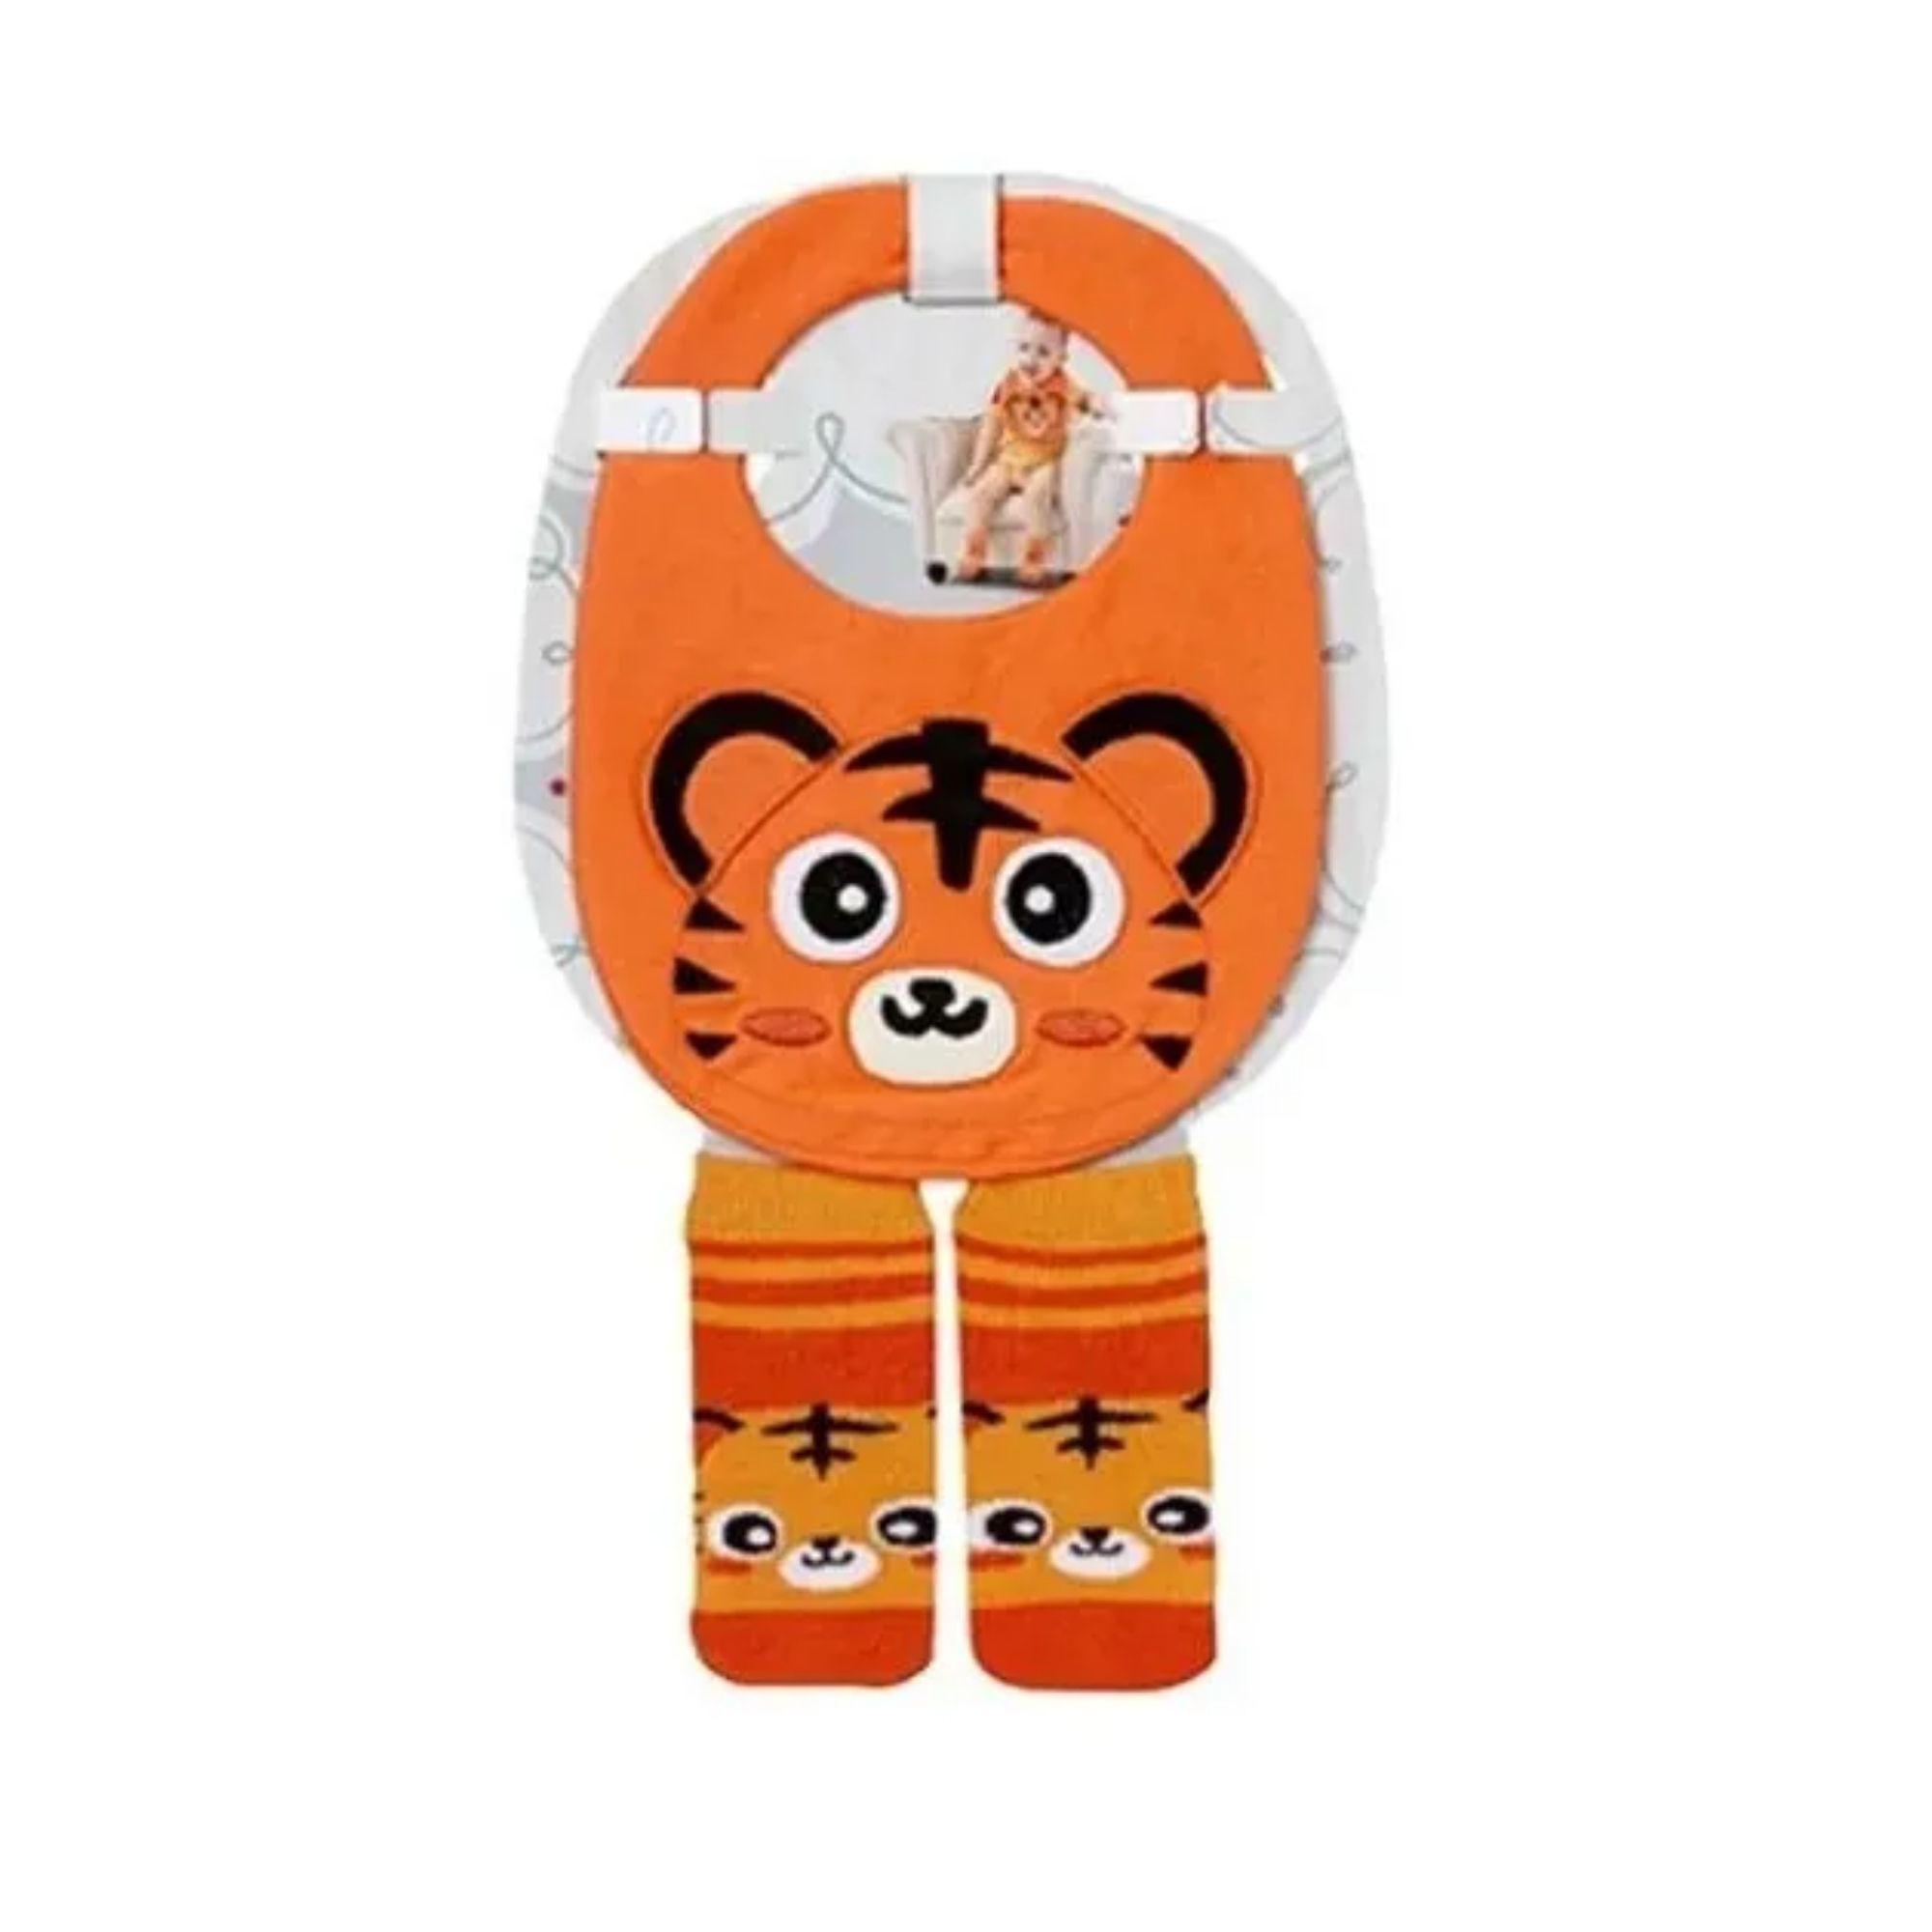 Kit Babador + meia para Bebê Infantil mesma estampa Colorido 4 a 8 meses  - Game Land Brinquedos